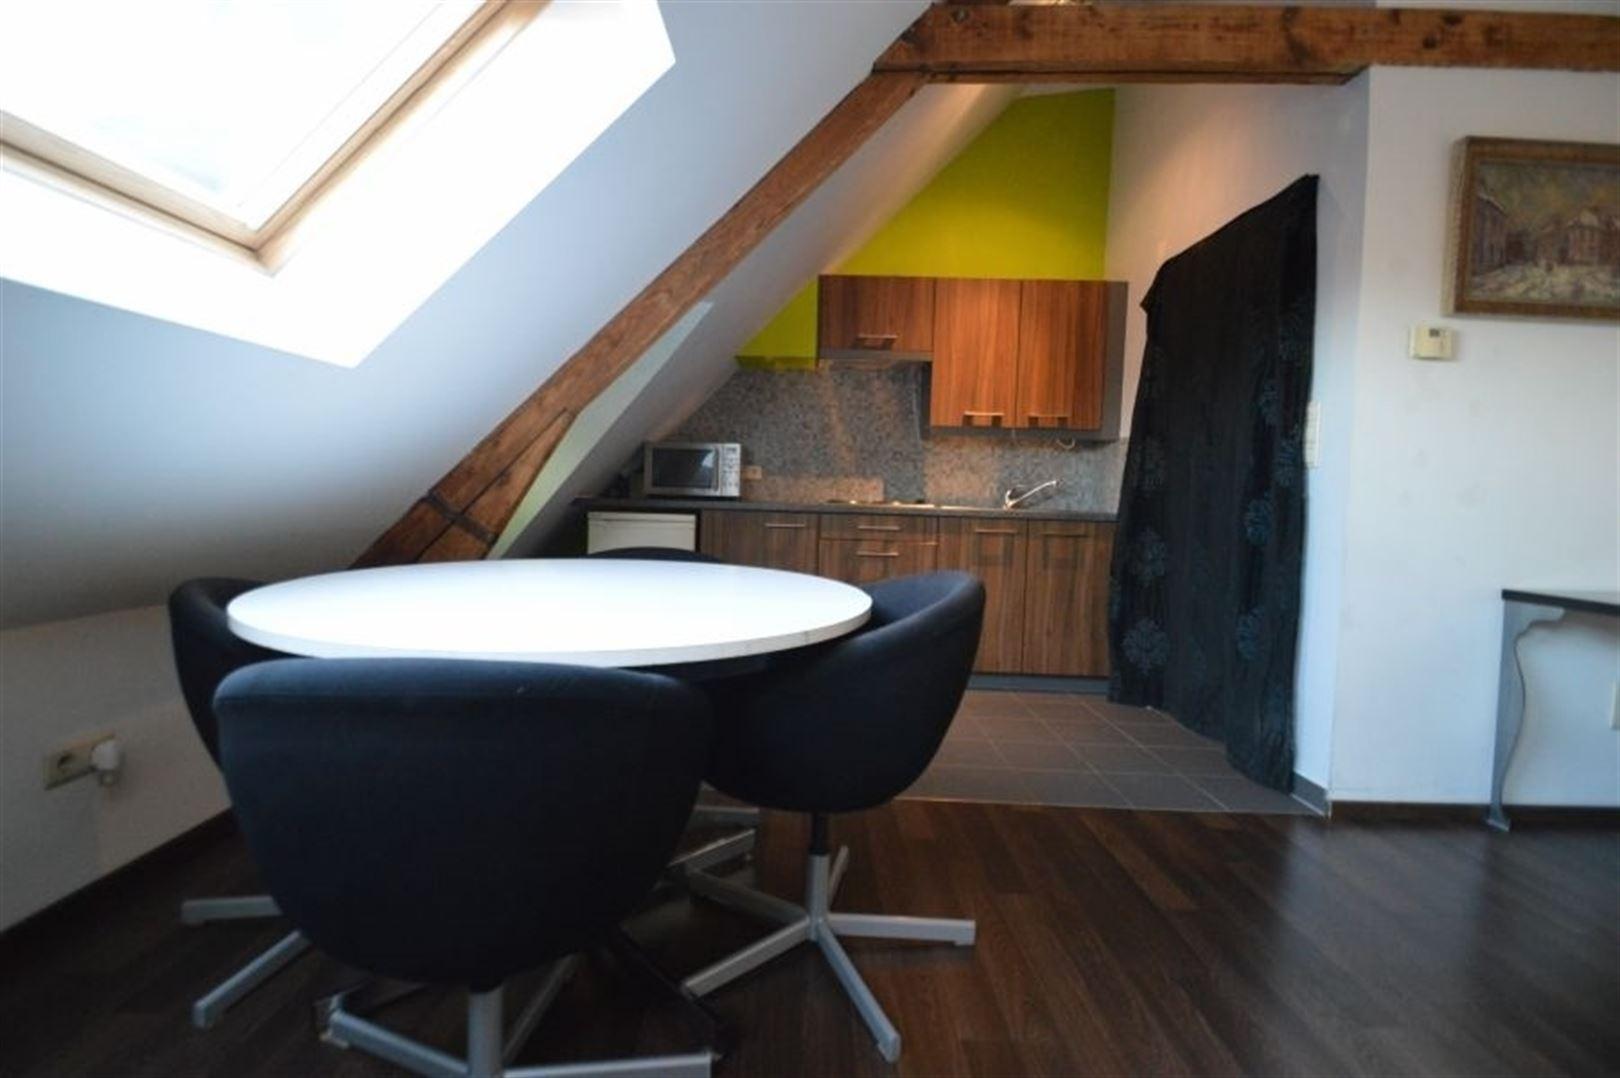 Foto 4 : Appartement te 9200 Dendermonde (België) - Prijs € 470